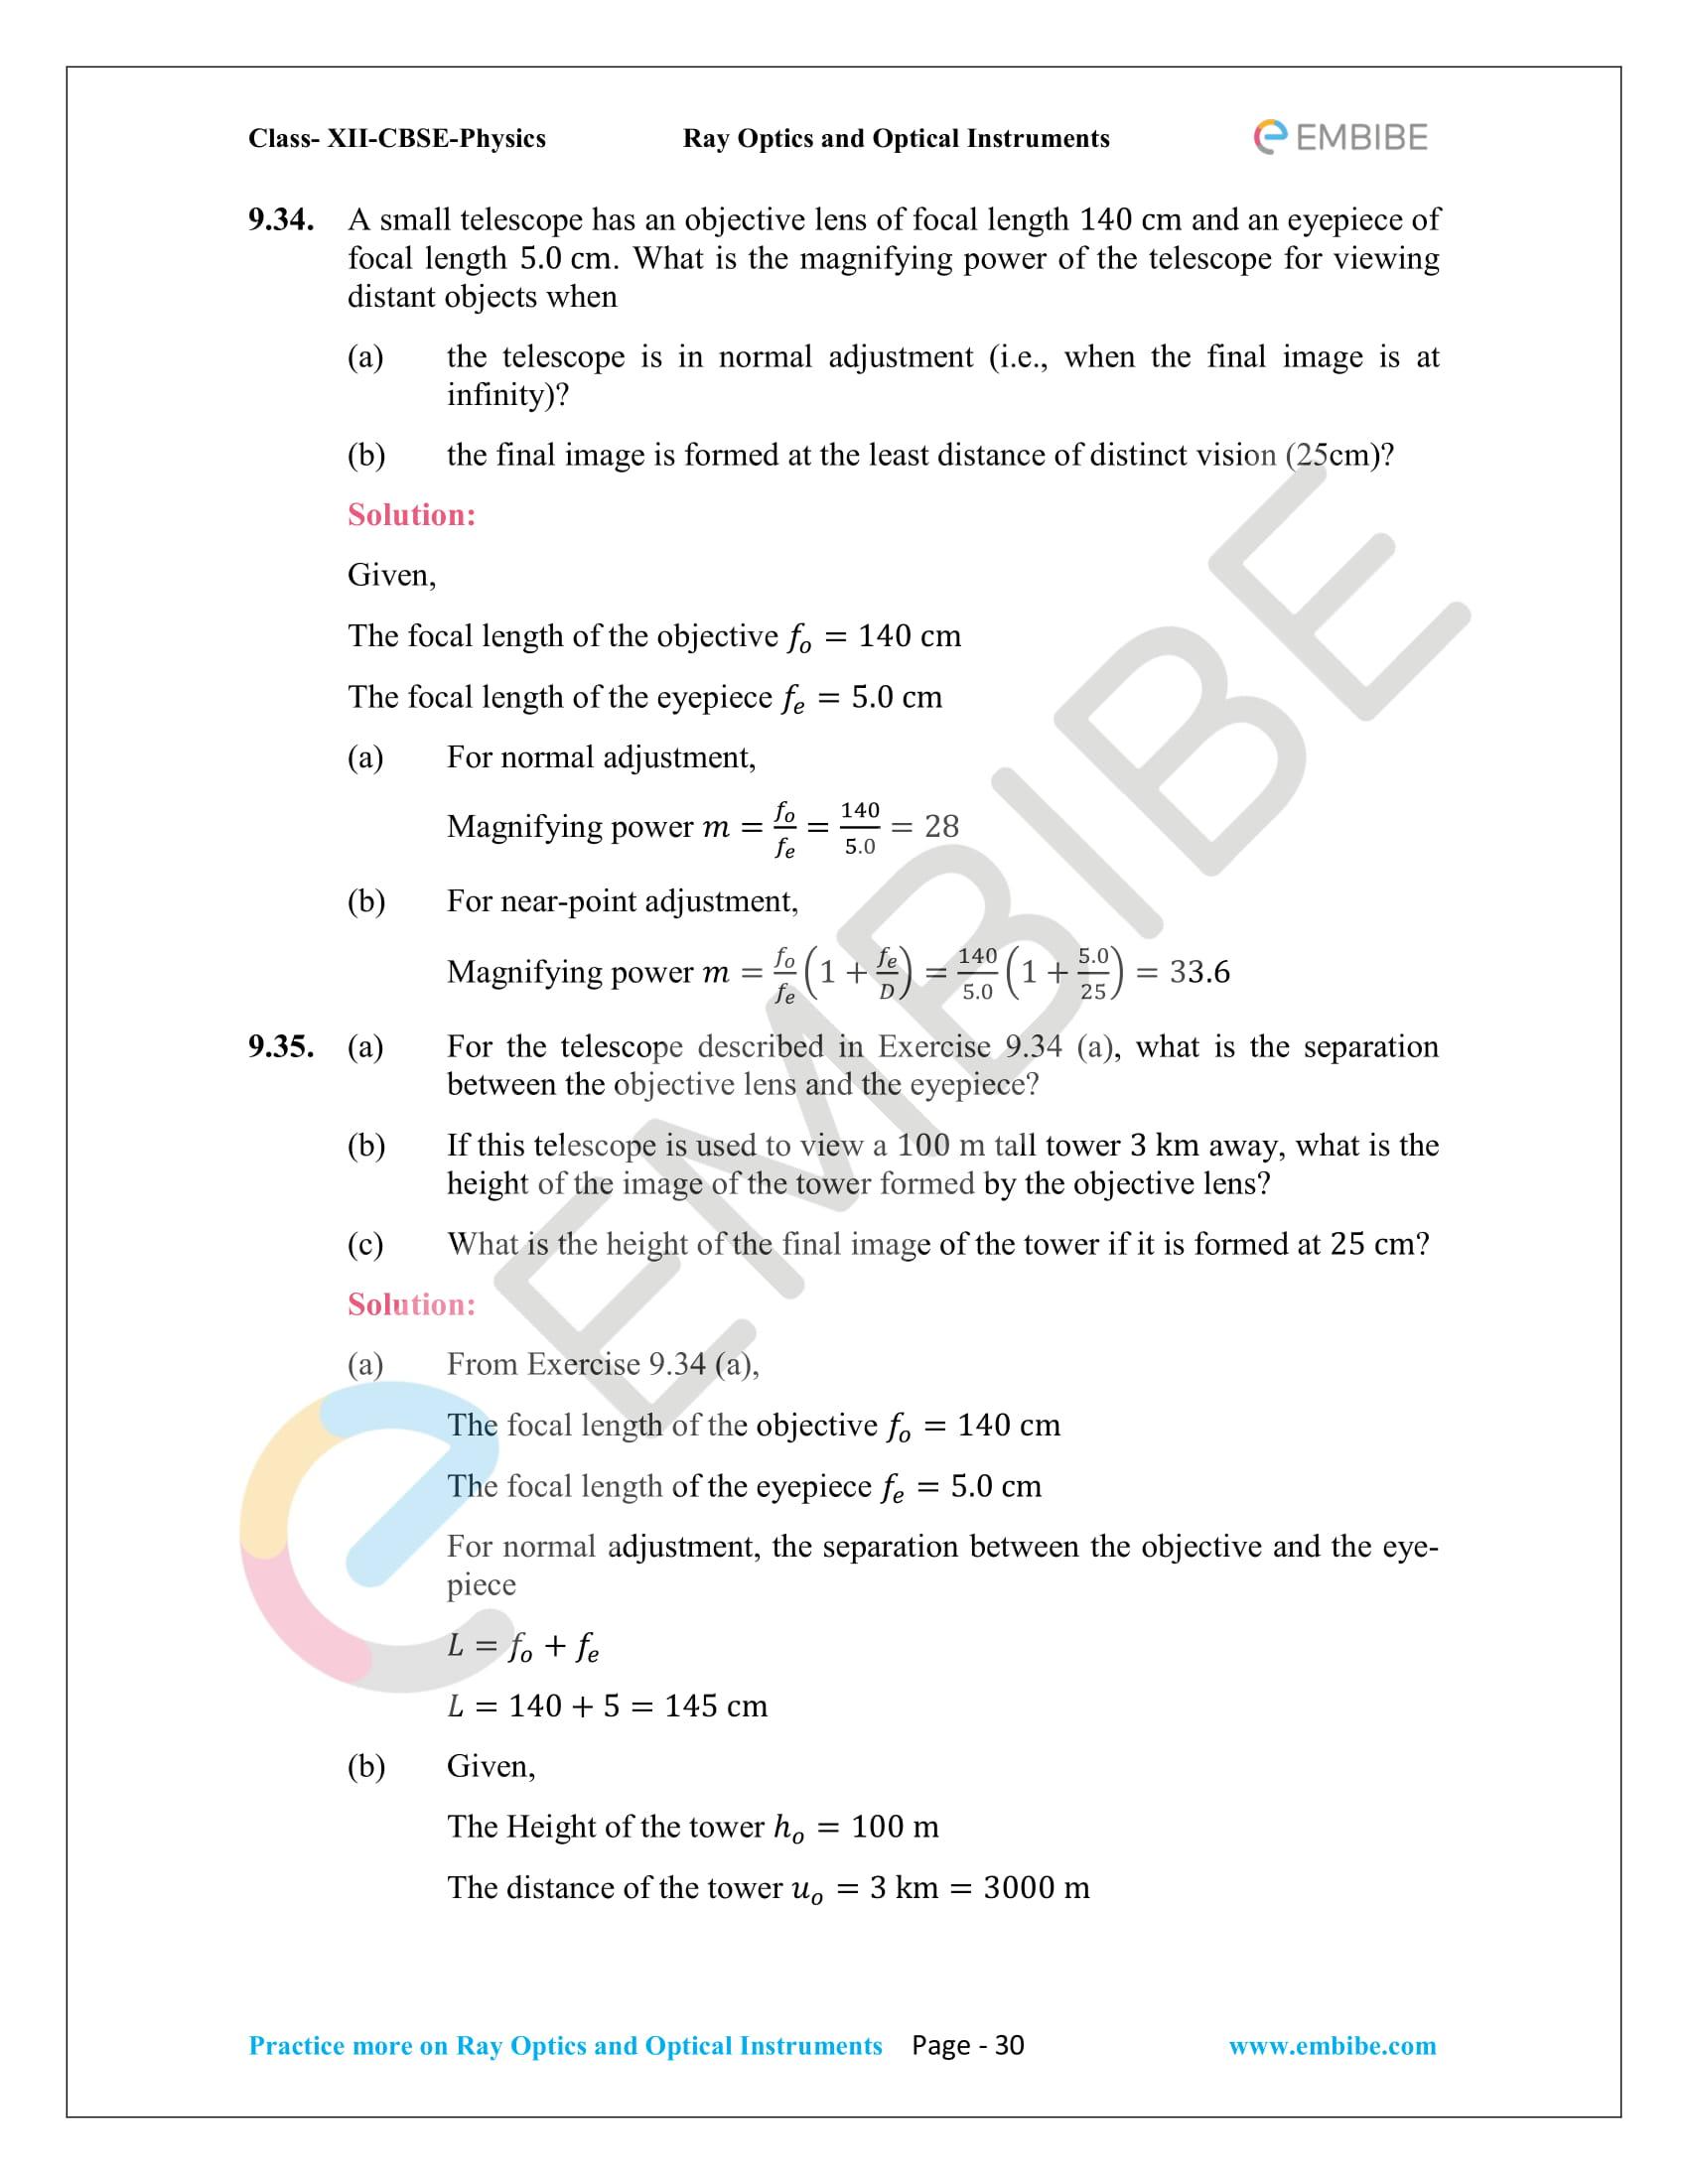 NCERT_Grade 12_Physics_Ch_09_Ray Optics-30